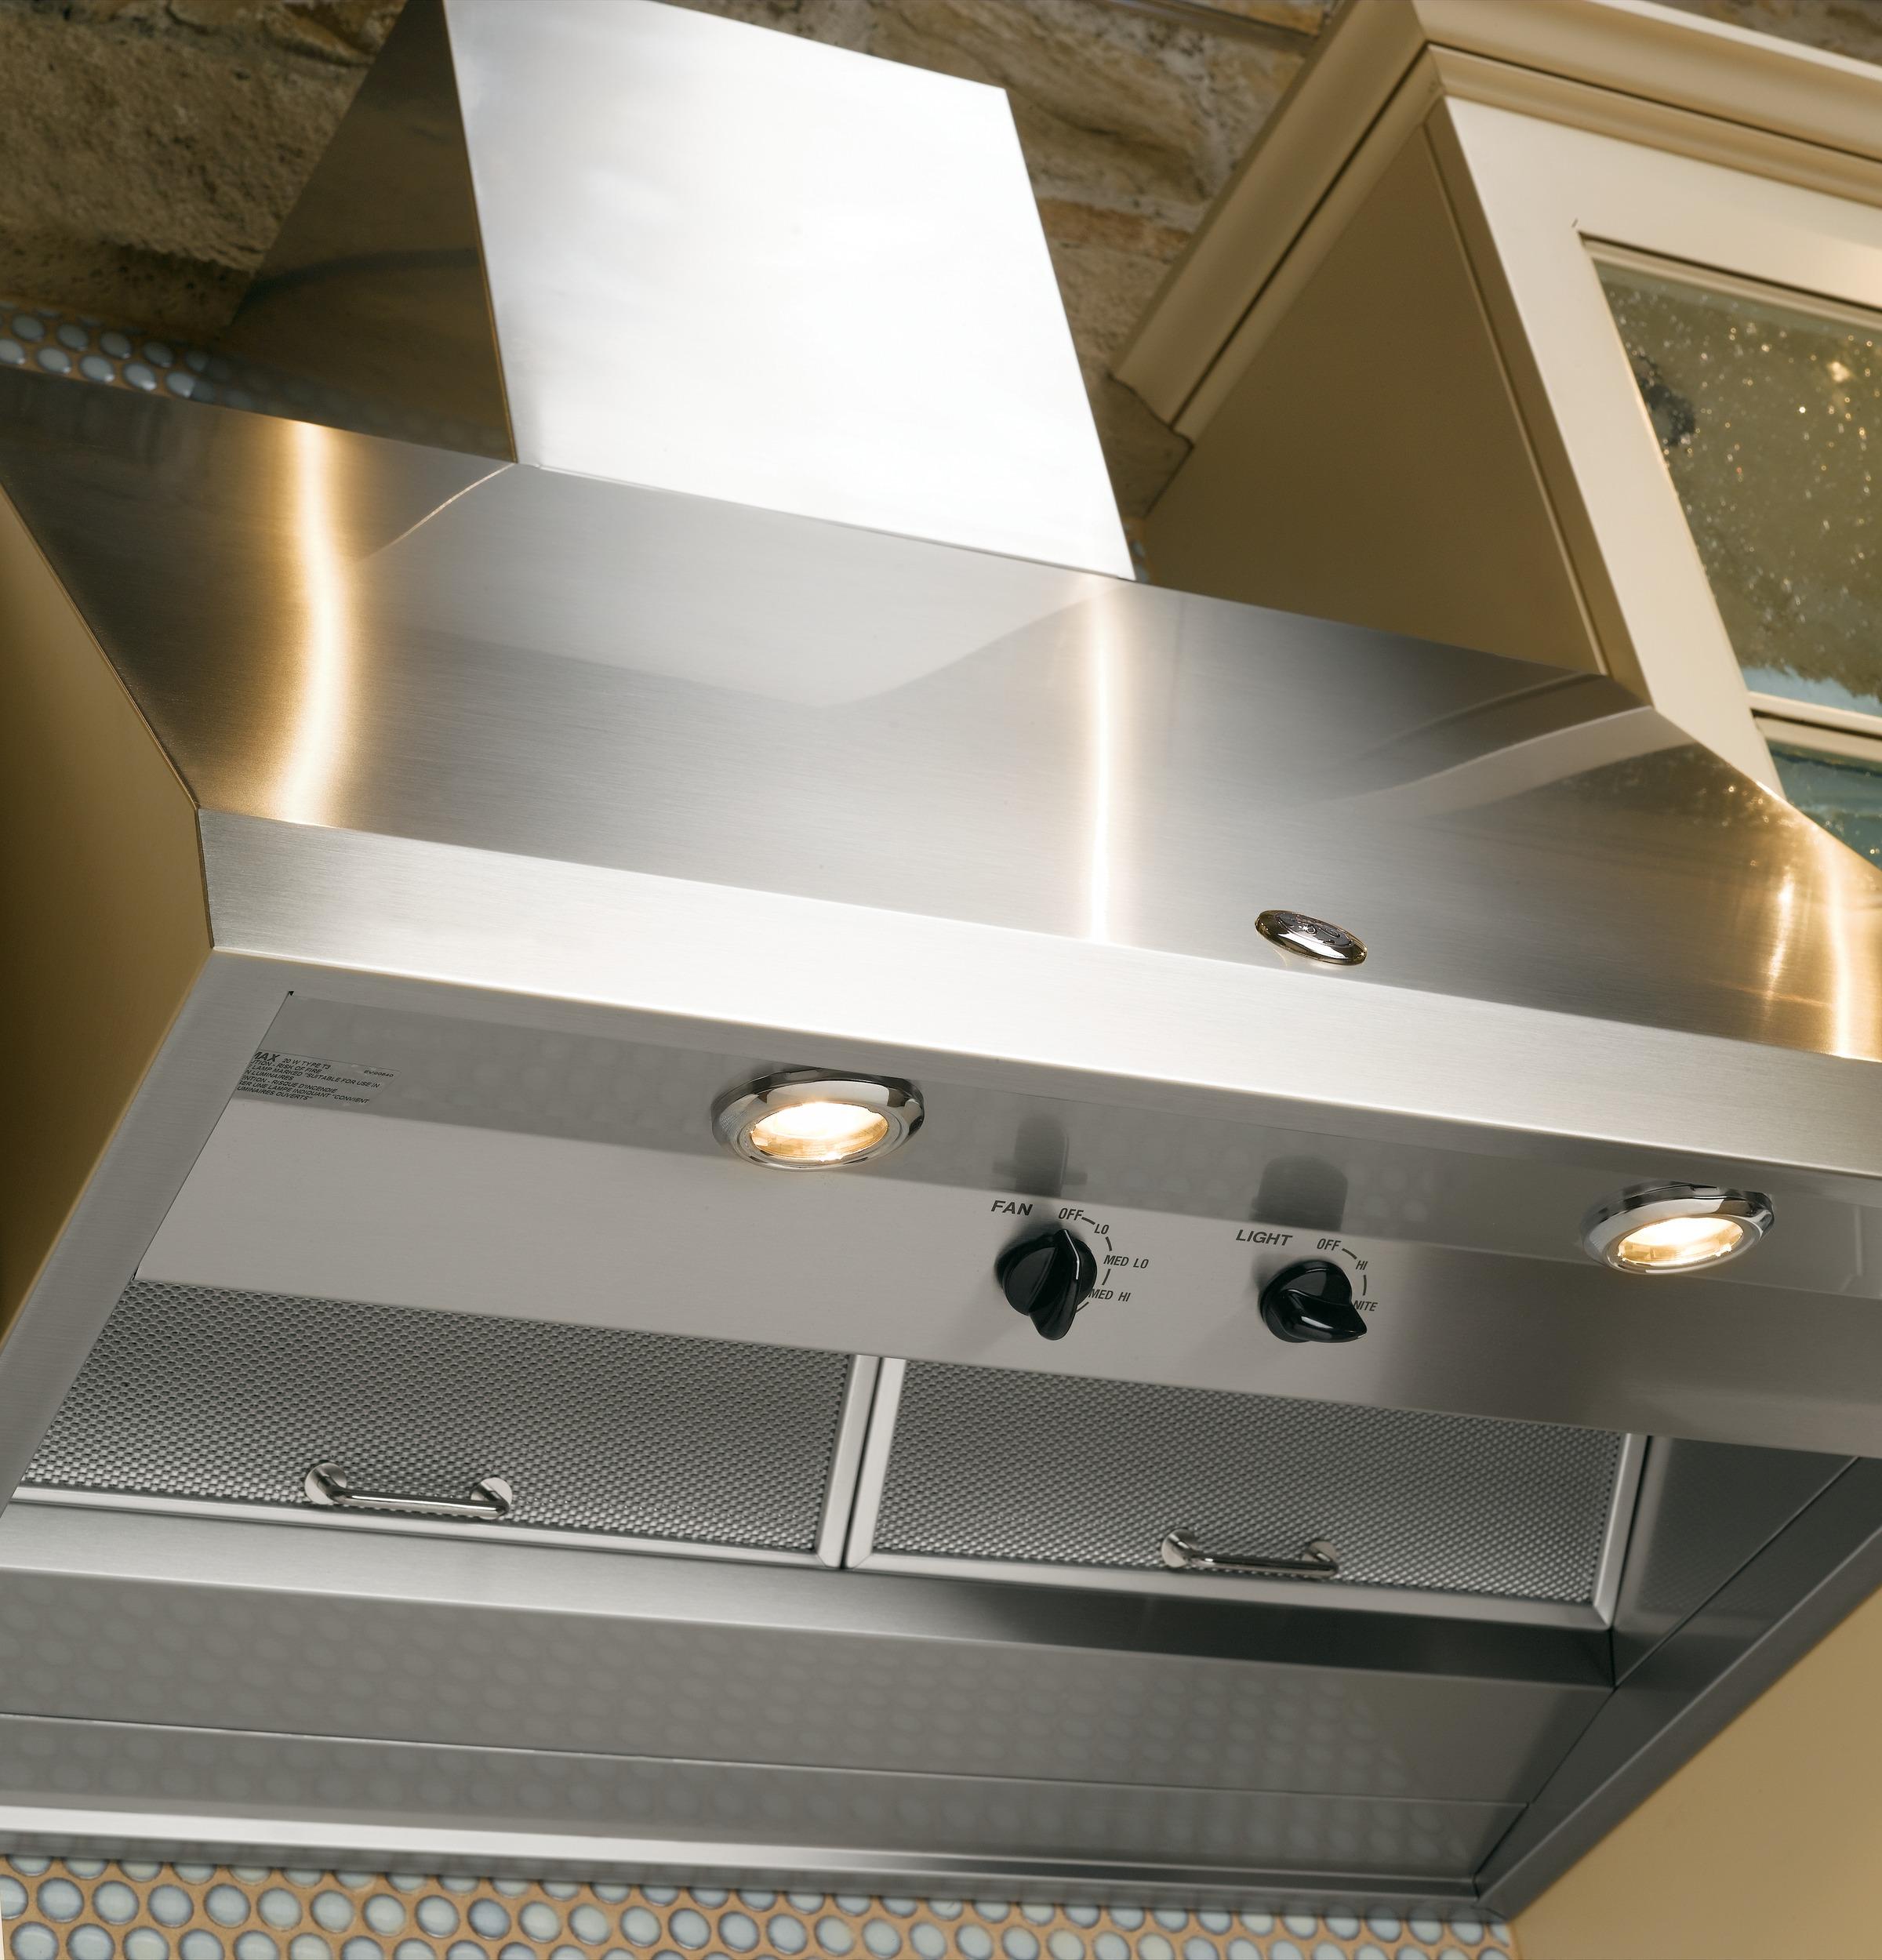 GE Cafe Ventilation Hoods - Cooking Appliances - Arizona ...